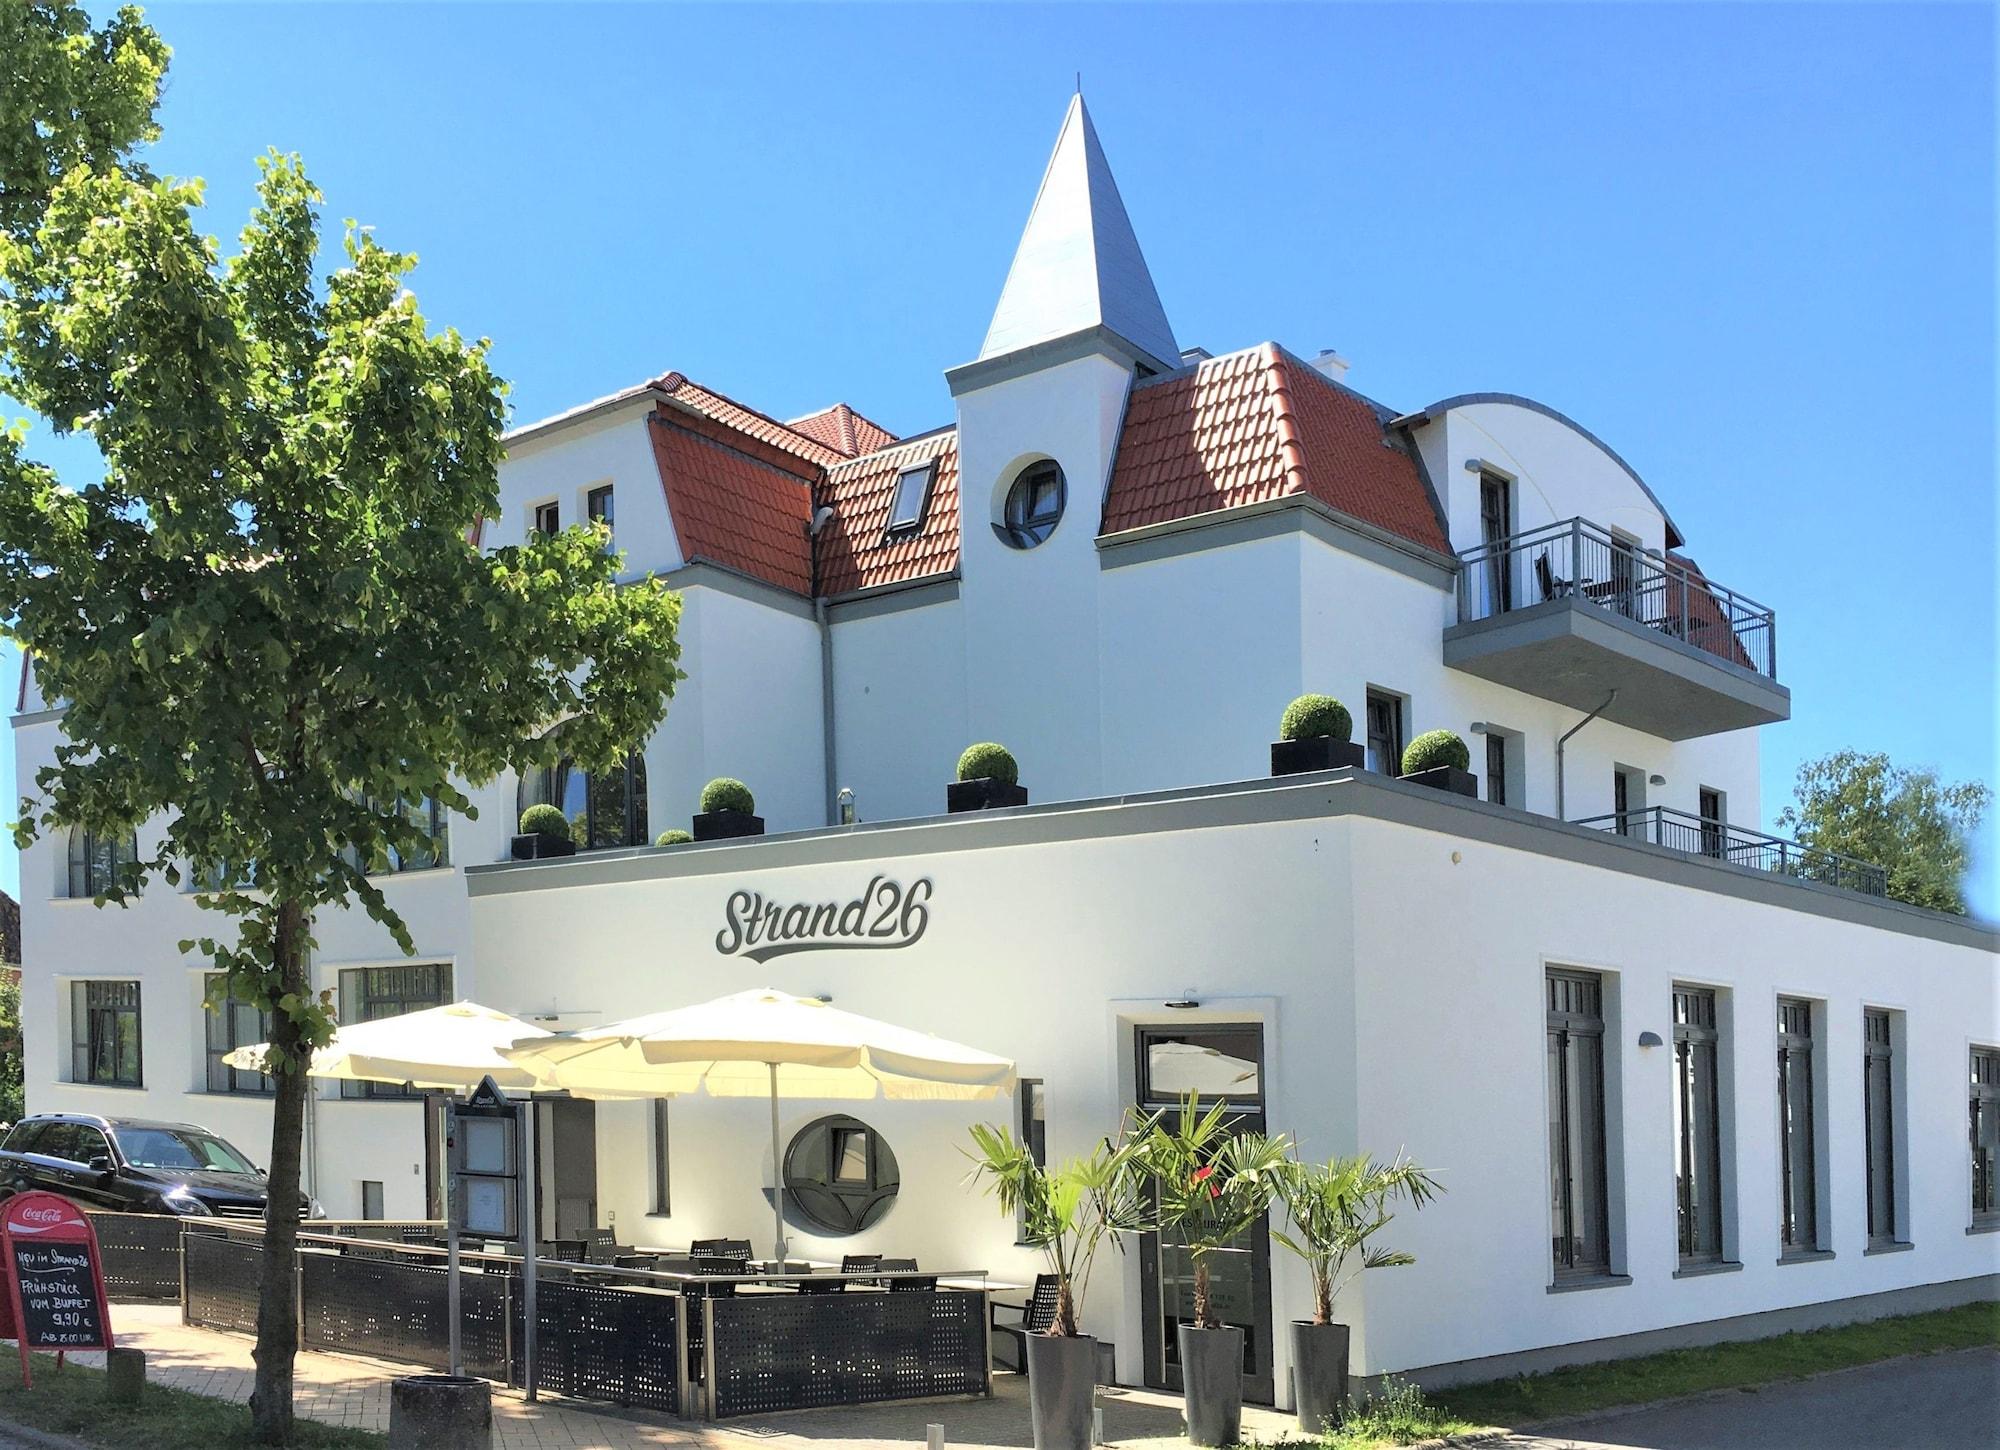 Hotel Strand26, Rostock